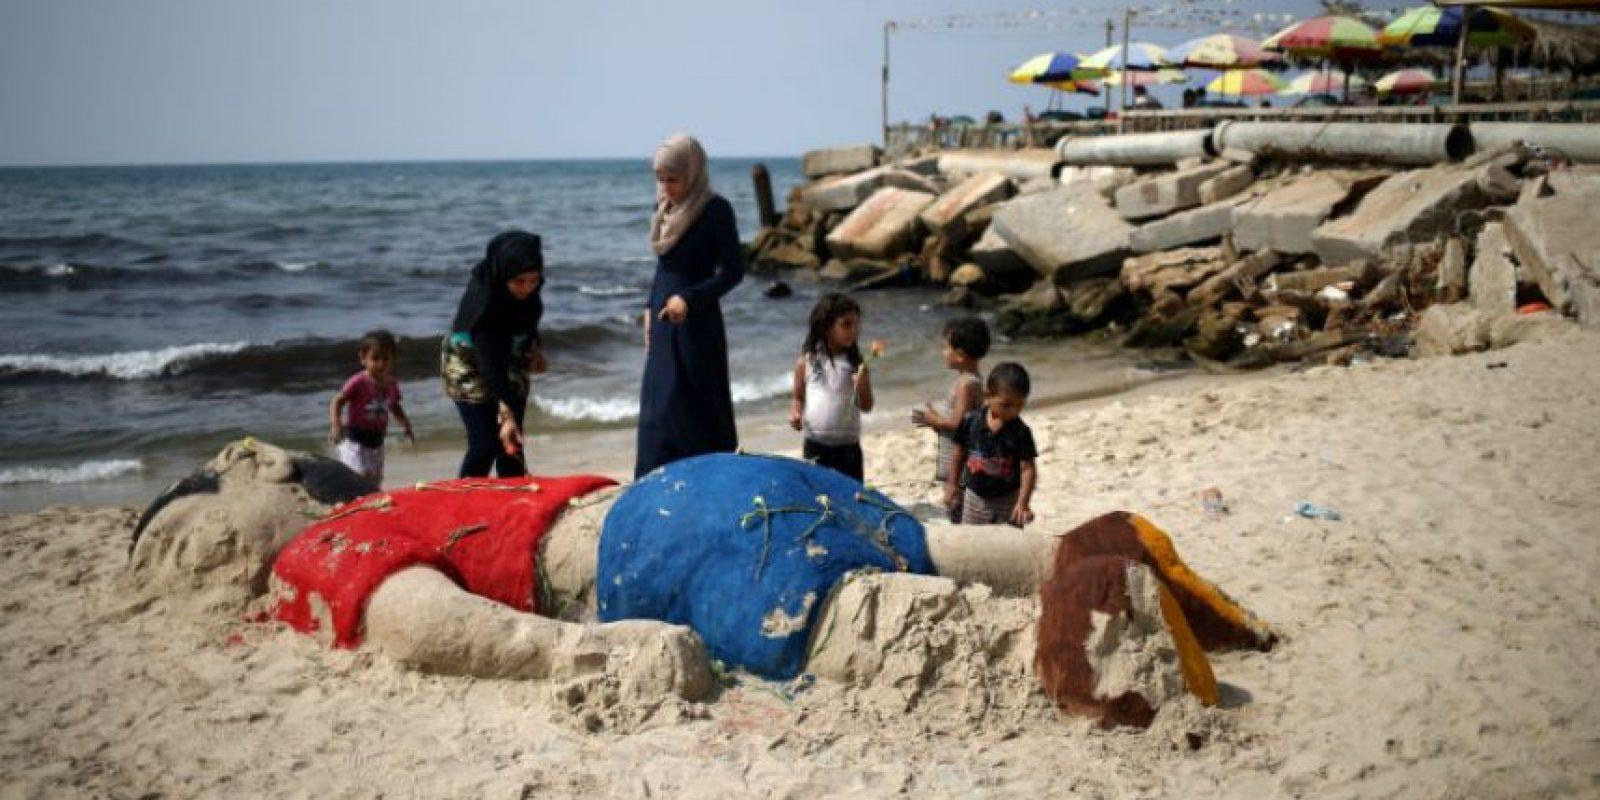 La imagén se convirtió en símbolo de la crisis de refugiados. Foto:AFP